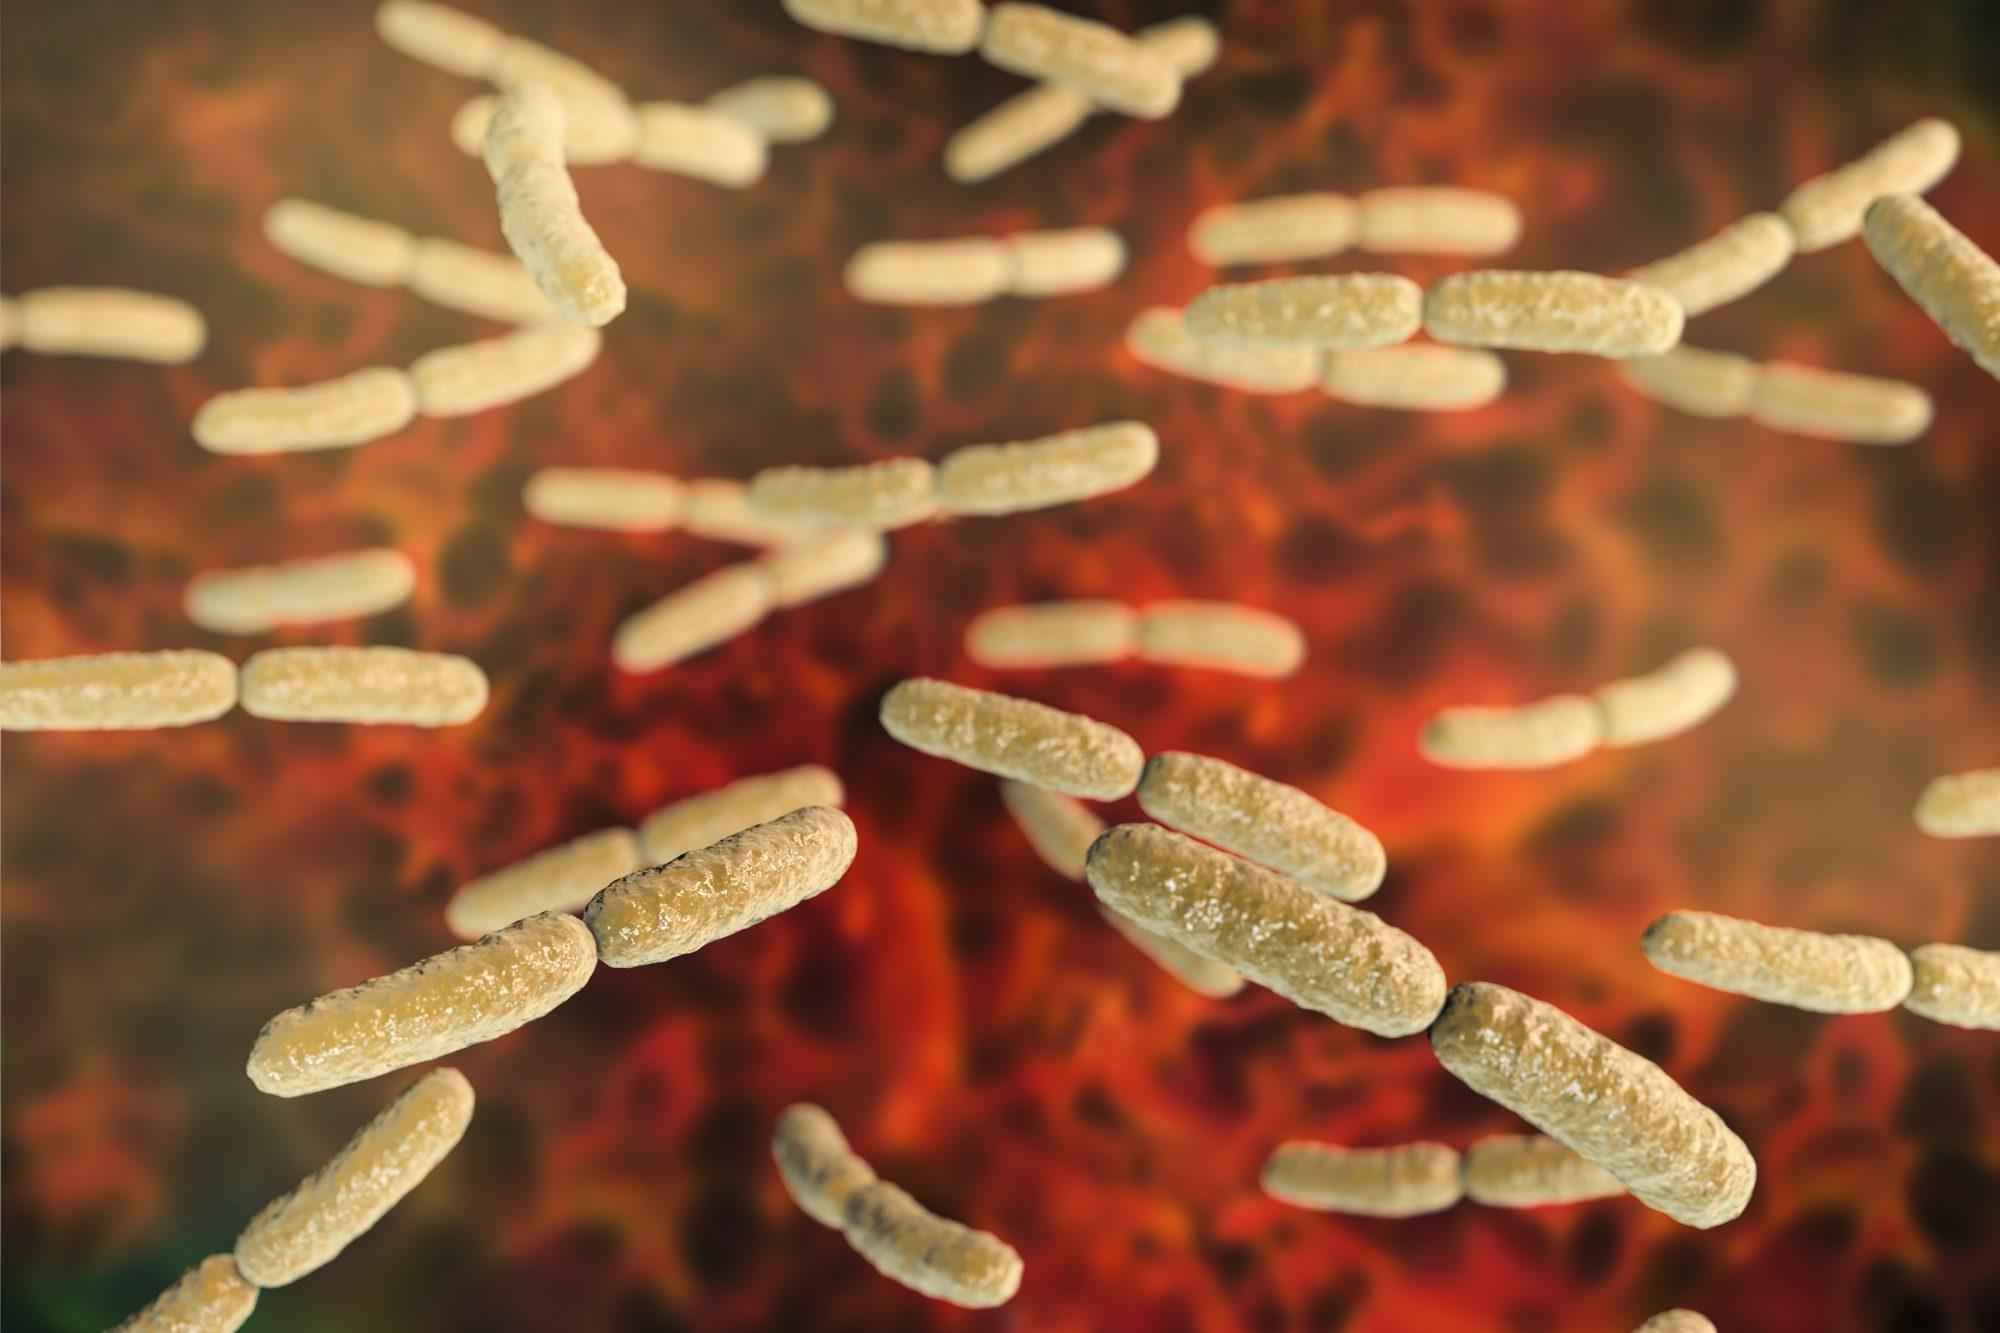 Bacteria Getty 3/30/20